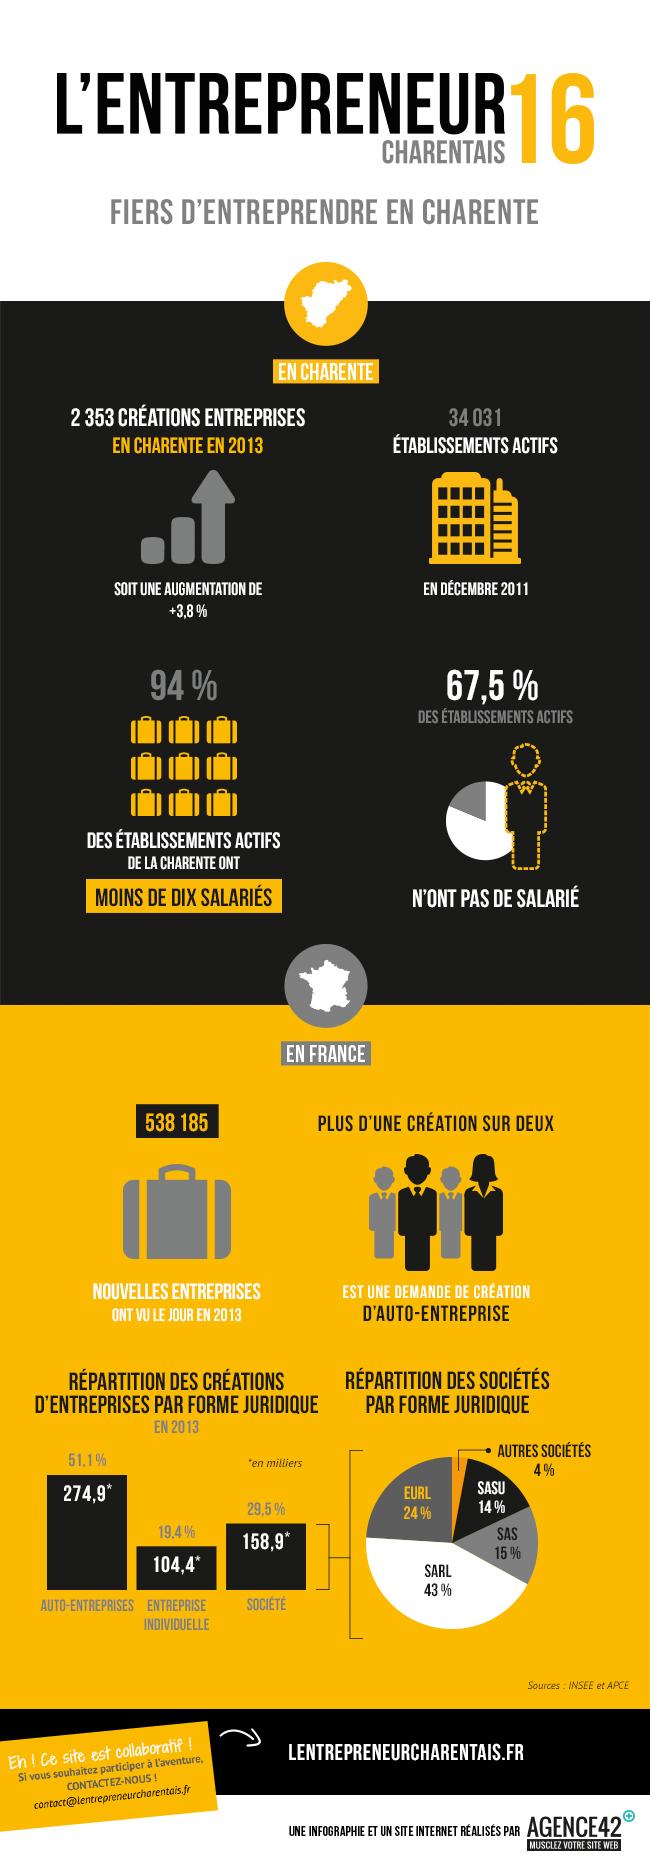 Entreprendre en charente infographie